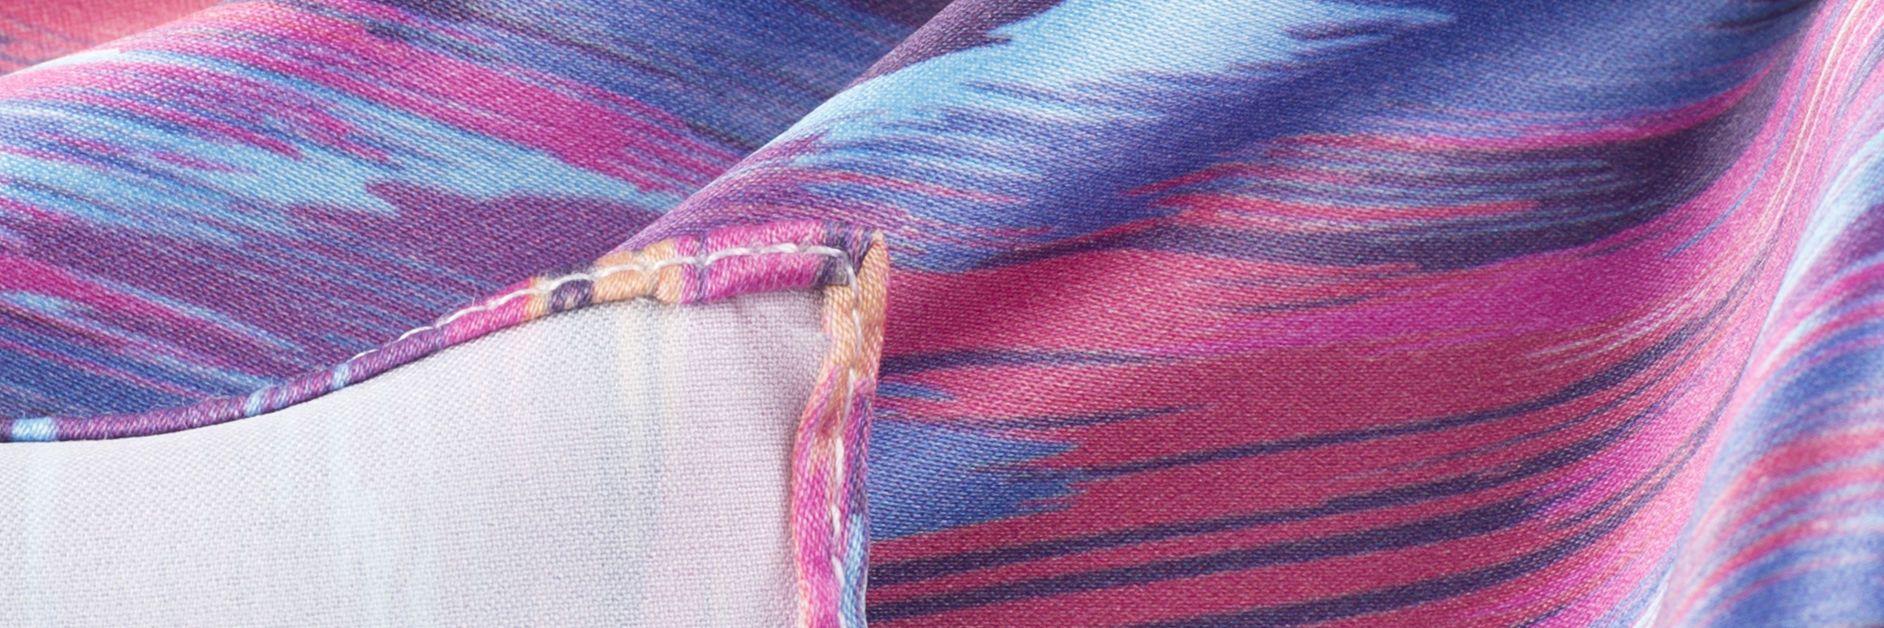 Silk Sensation tyg ikon